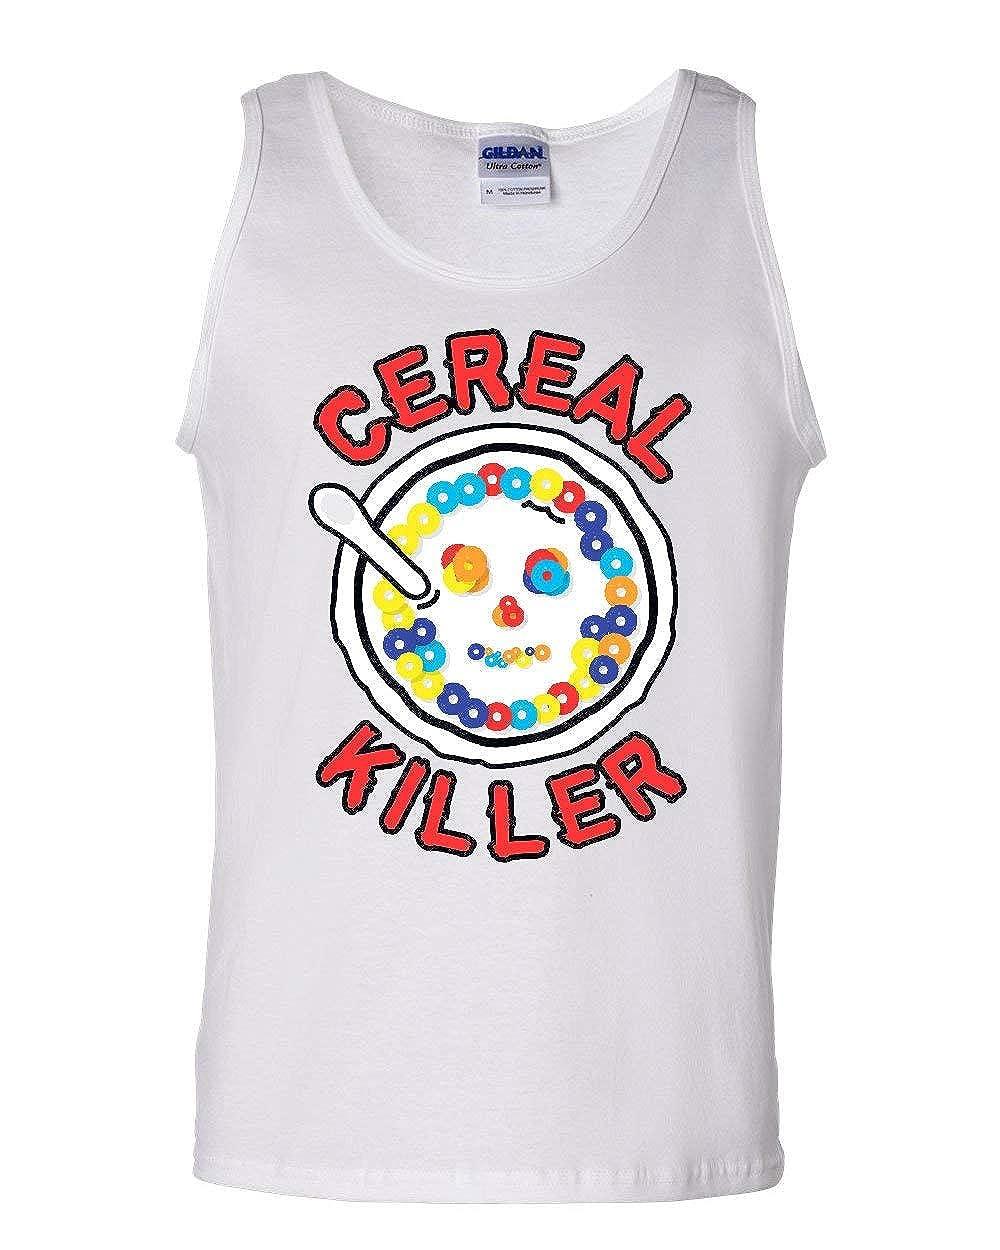 Cereal Killer Tank Top Funny Breakfast Morning Meal Serial Killer Sleeveless